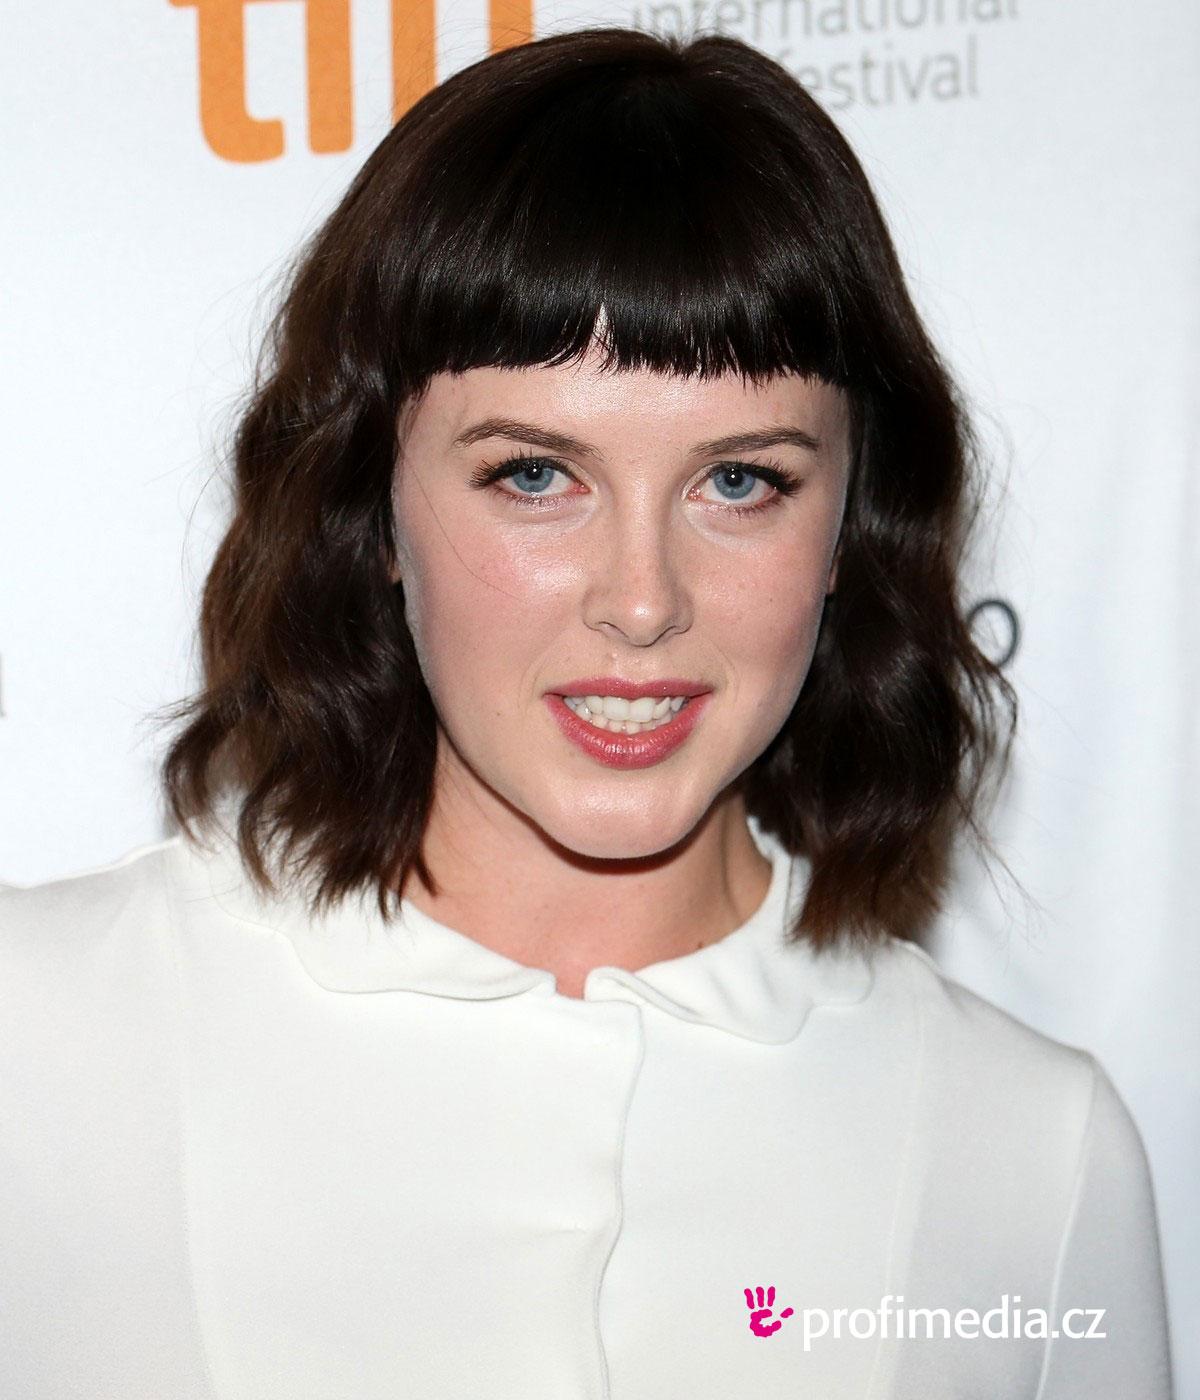 Alexandra roach coiffure happyhair for Miroir virtuel coiffure